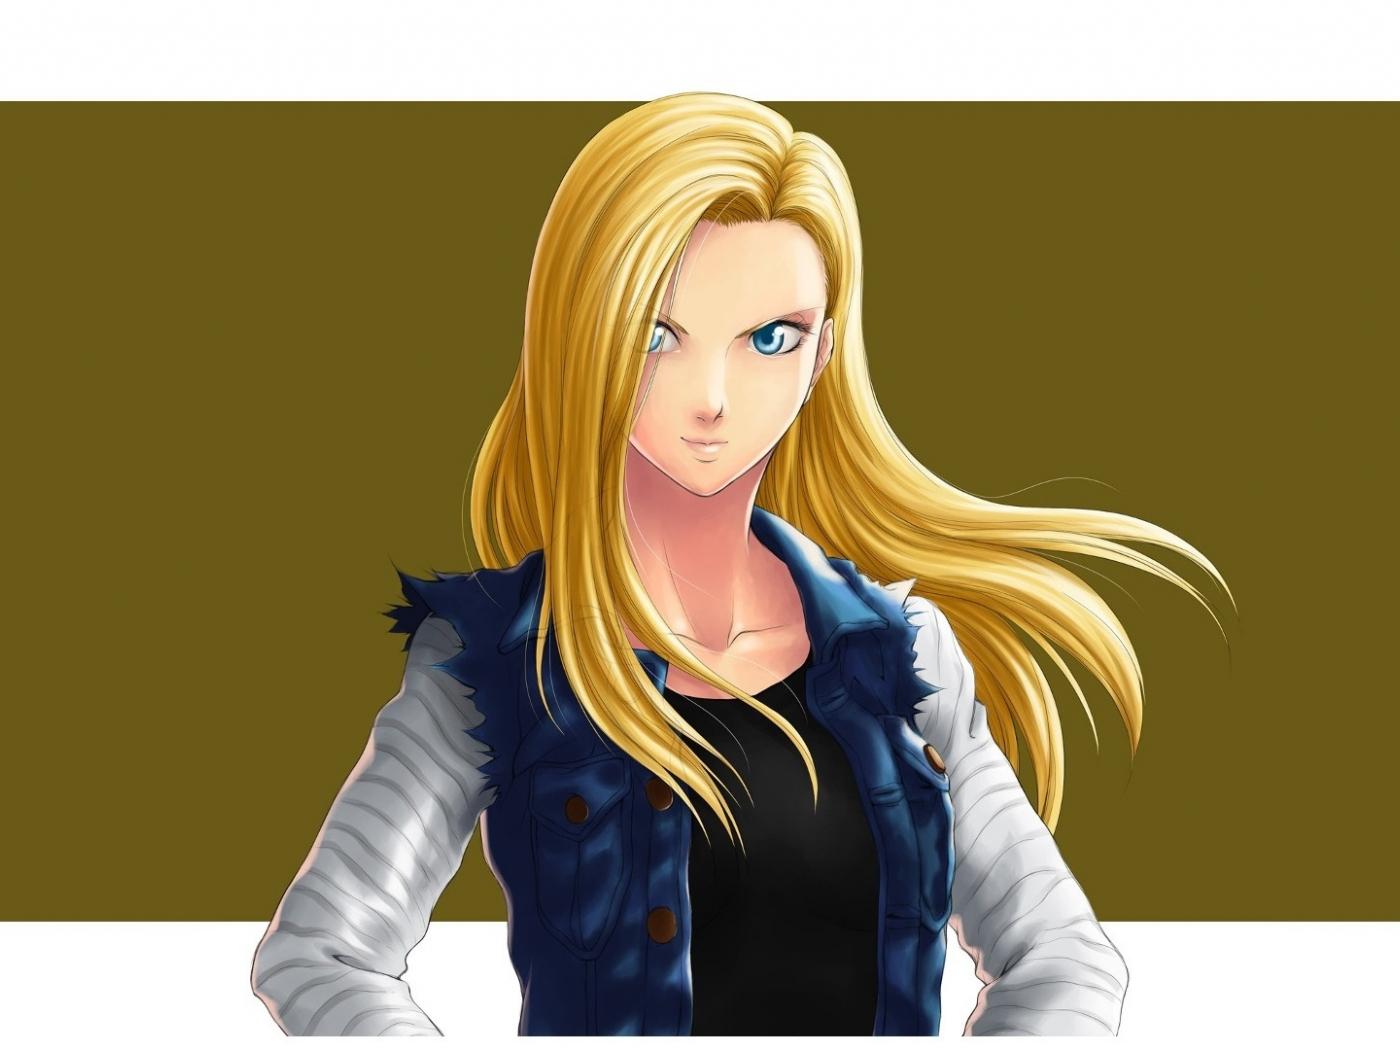 Download 1400x1050 Wallpaper Beautiful Anime Girl Android 18 Dragan Ball Standard 4 3 Fullscreen 1400x1050 Hd Image Background 17311